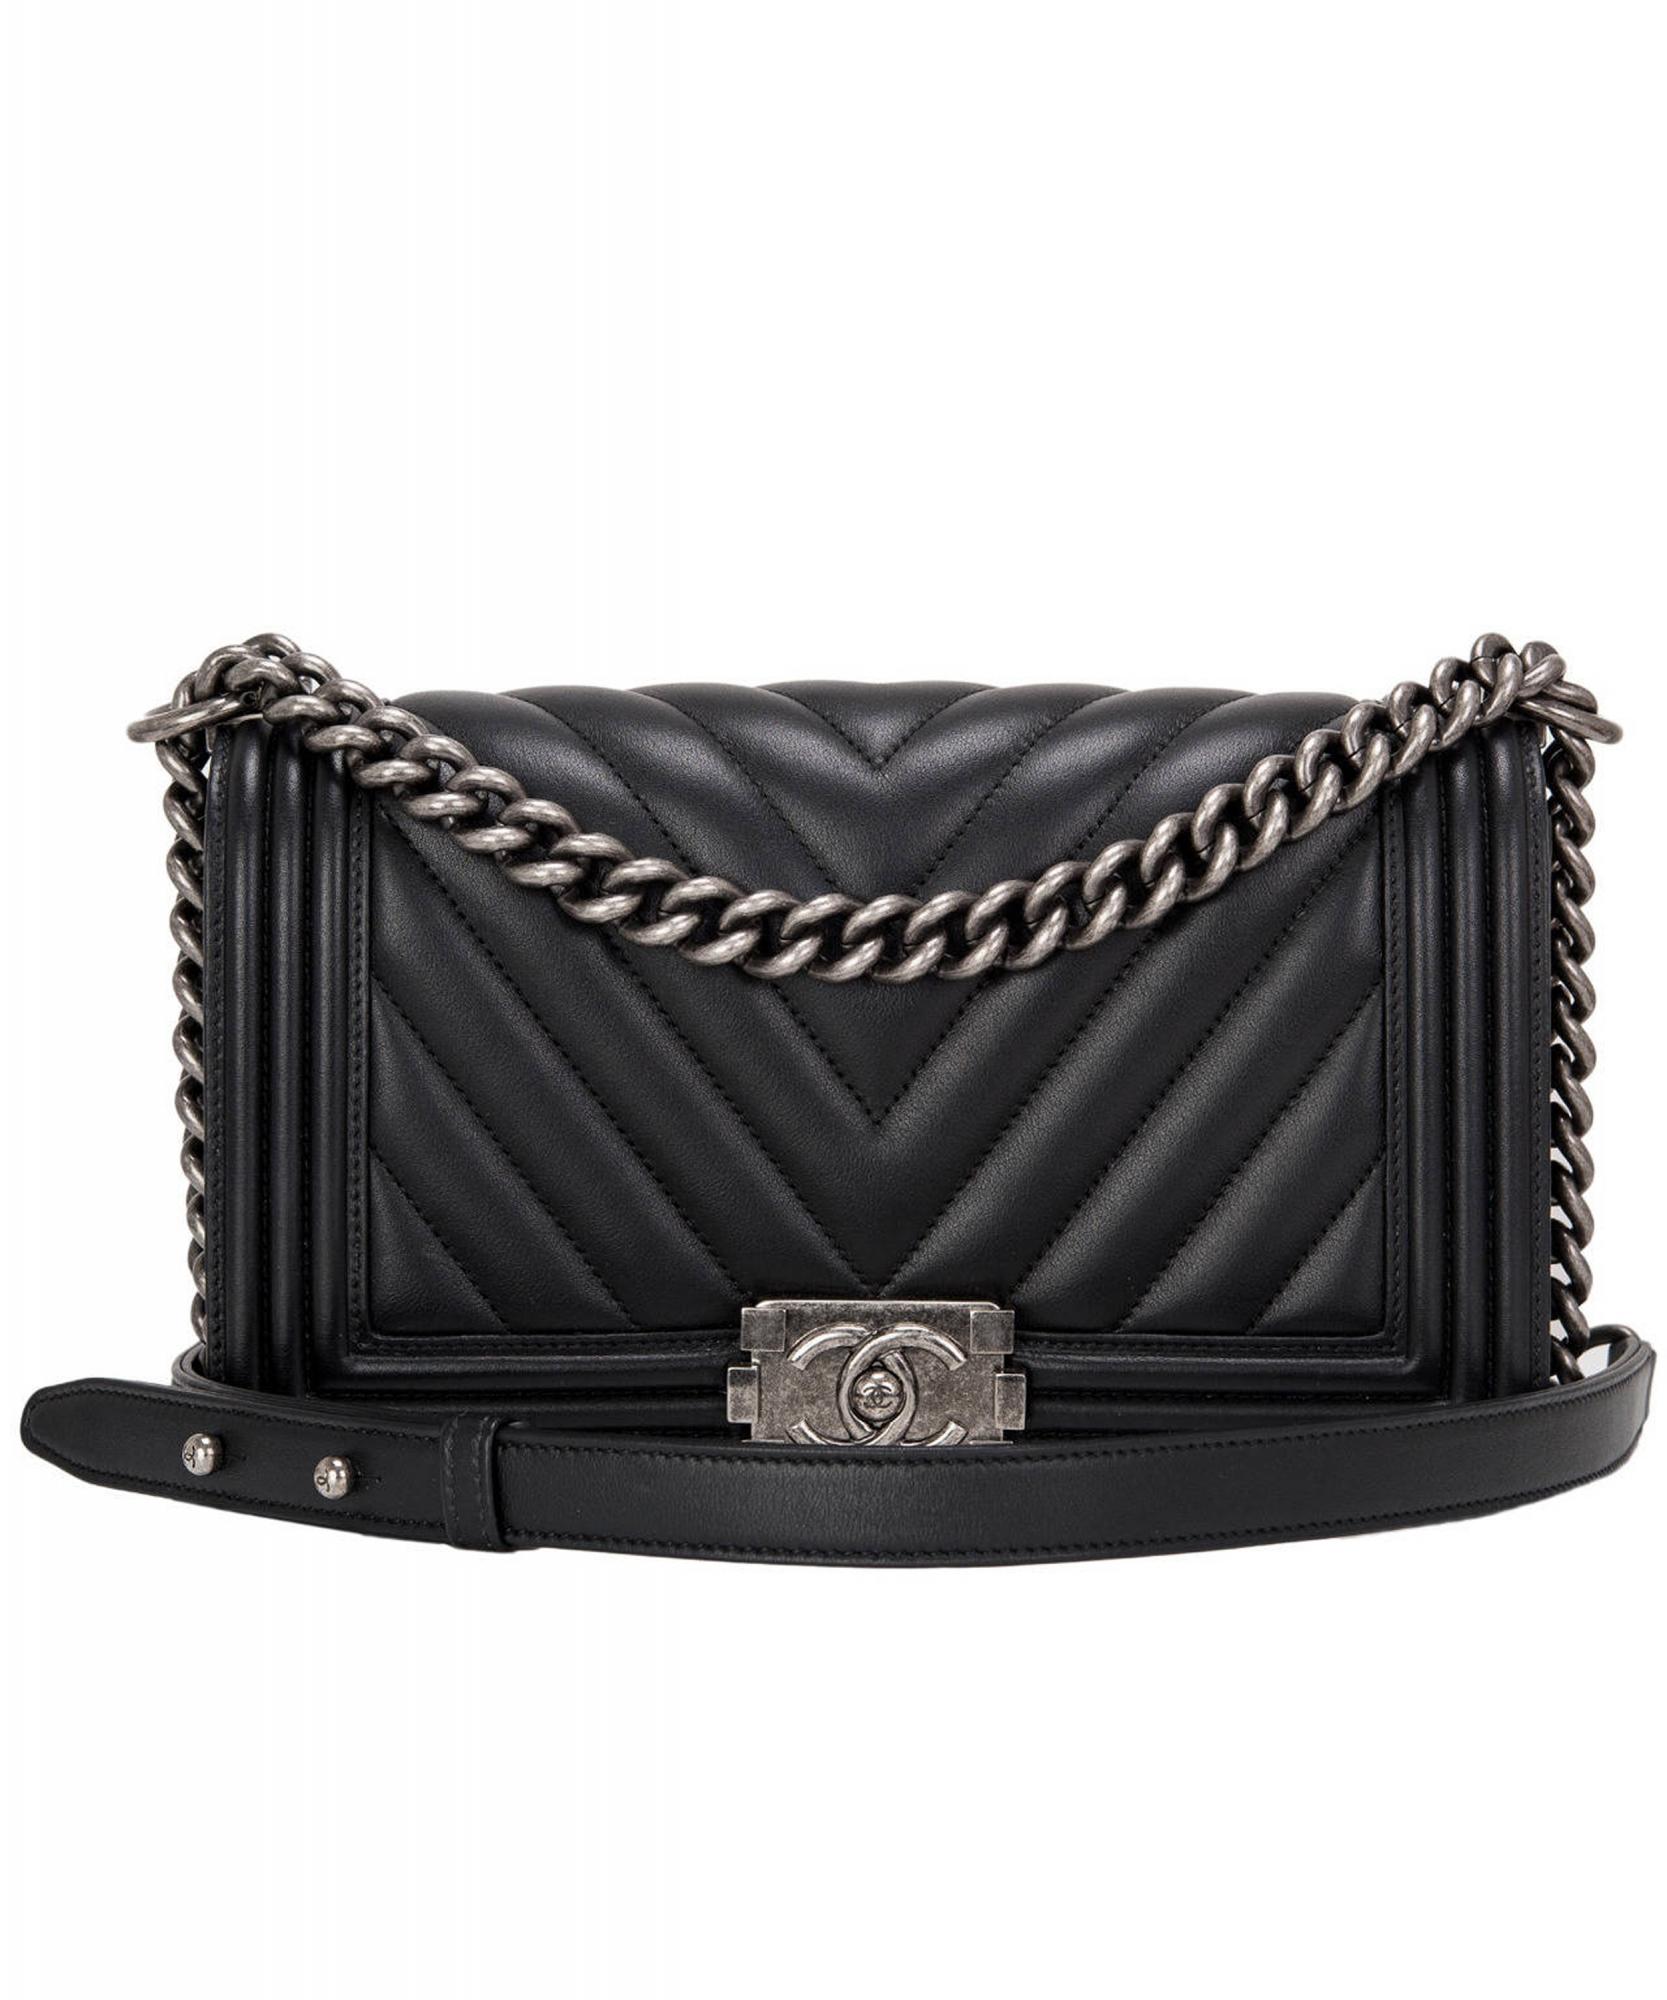 aca9aa360975 Chanel Black Chevron Quilted Boy Bag New Medium